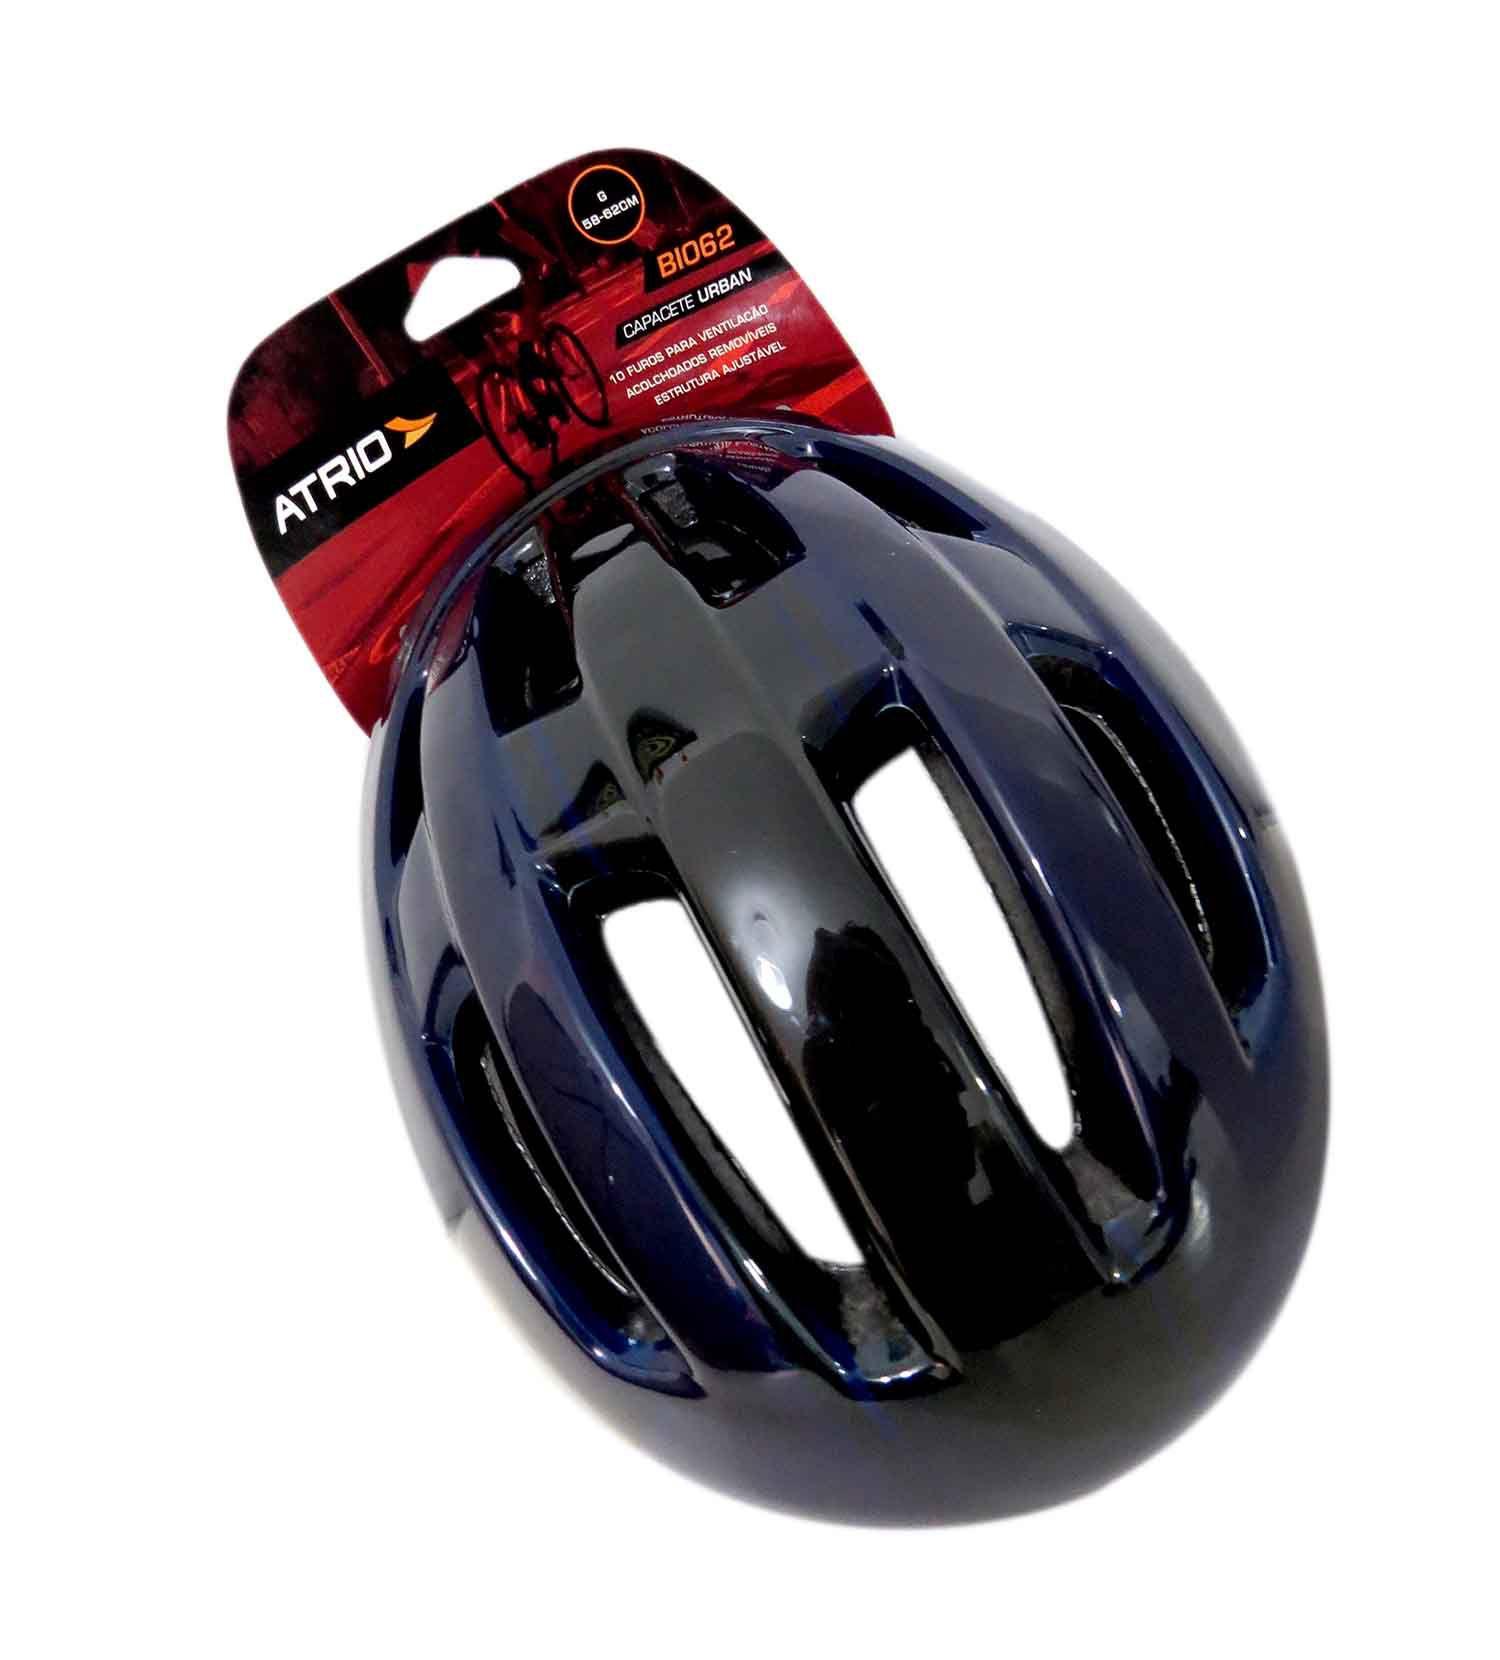 Capacete Preto Urban Ciclismo Bike Bicicleta Tam. G 58-62cm